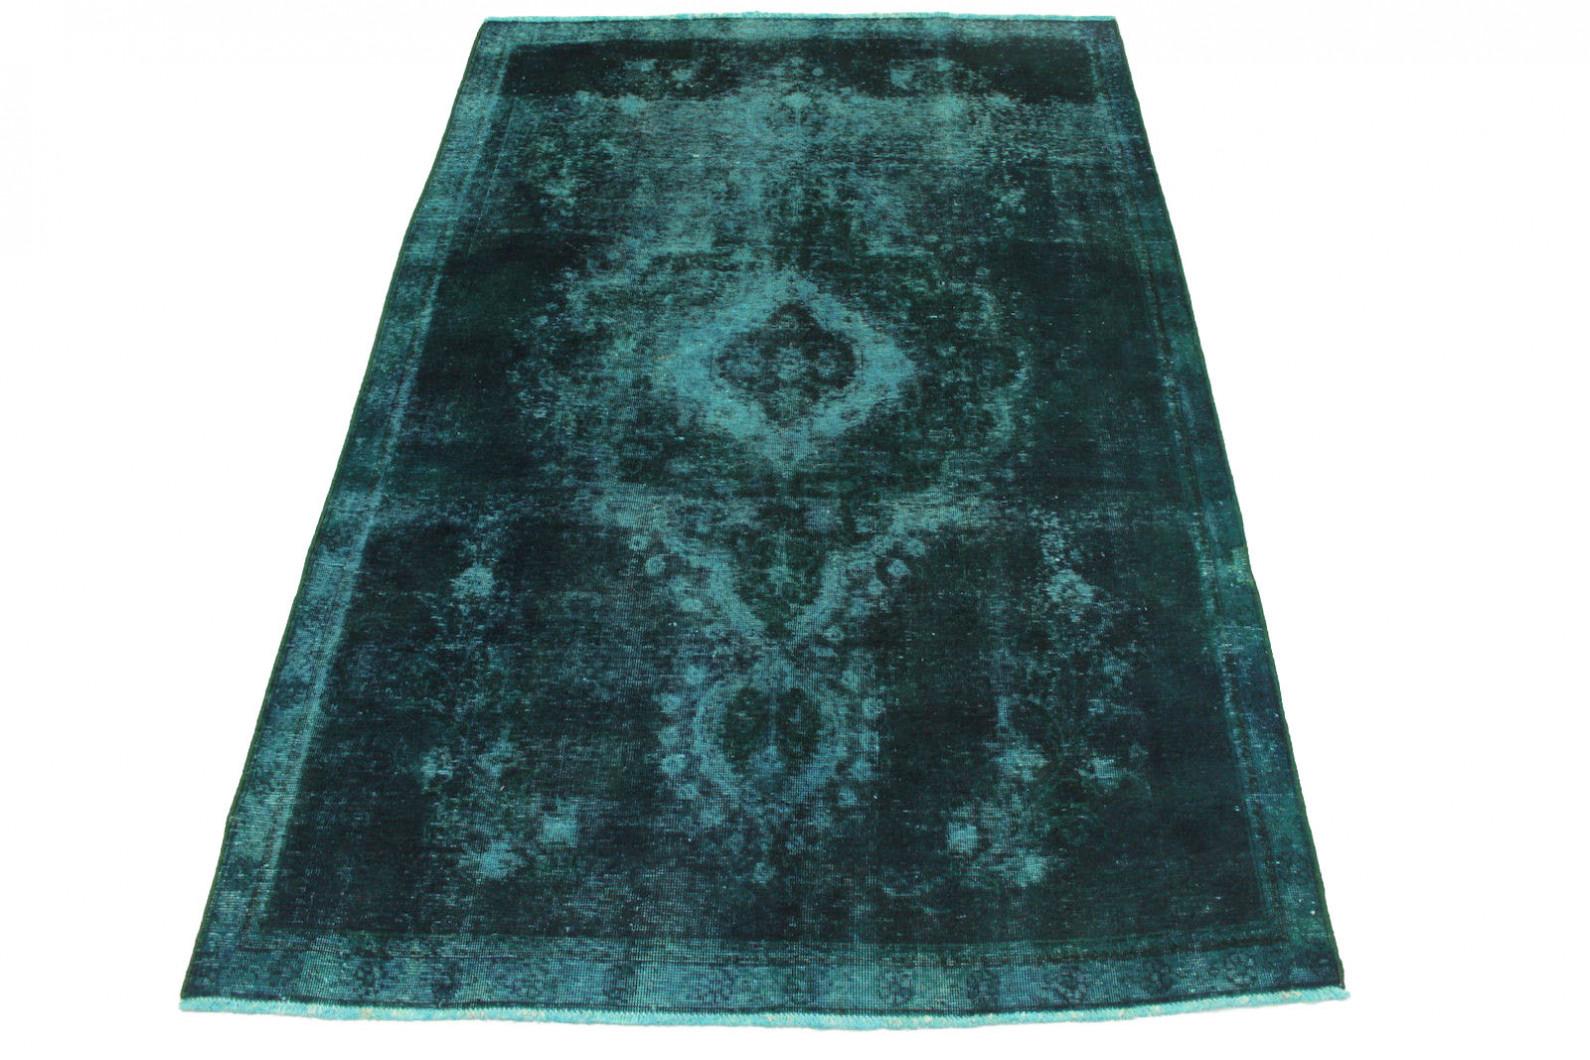 vintage teppich blau t rkis in 280x180cm 1001 2724 bei. Black Bedroom Furniture Sets. Home Design Ideas